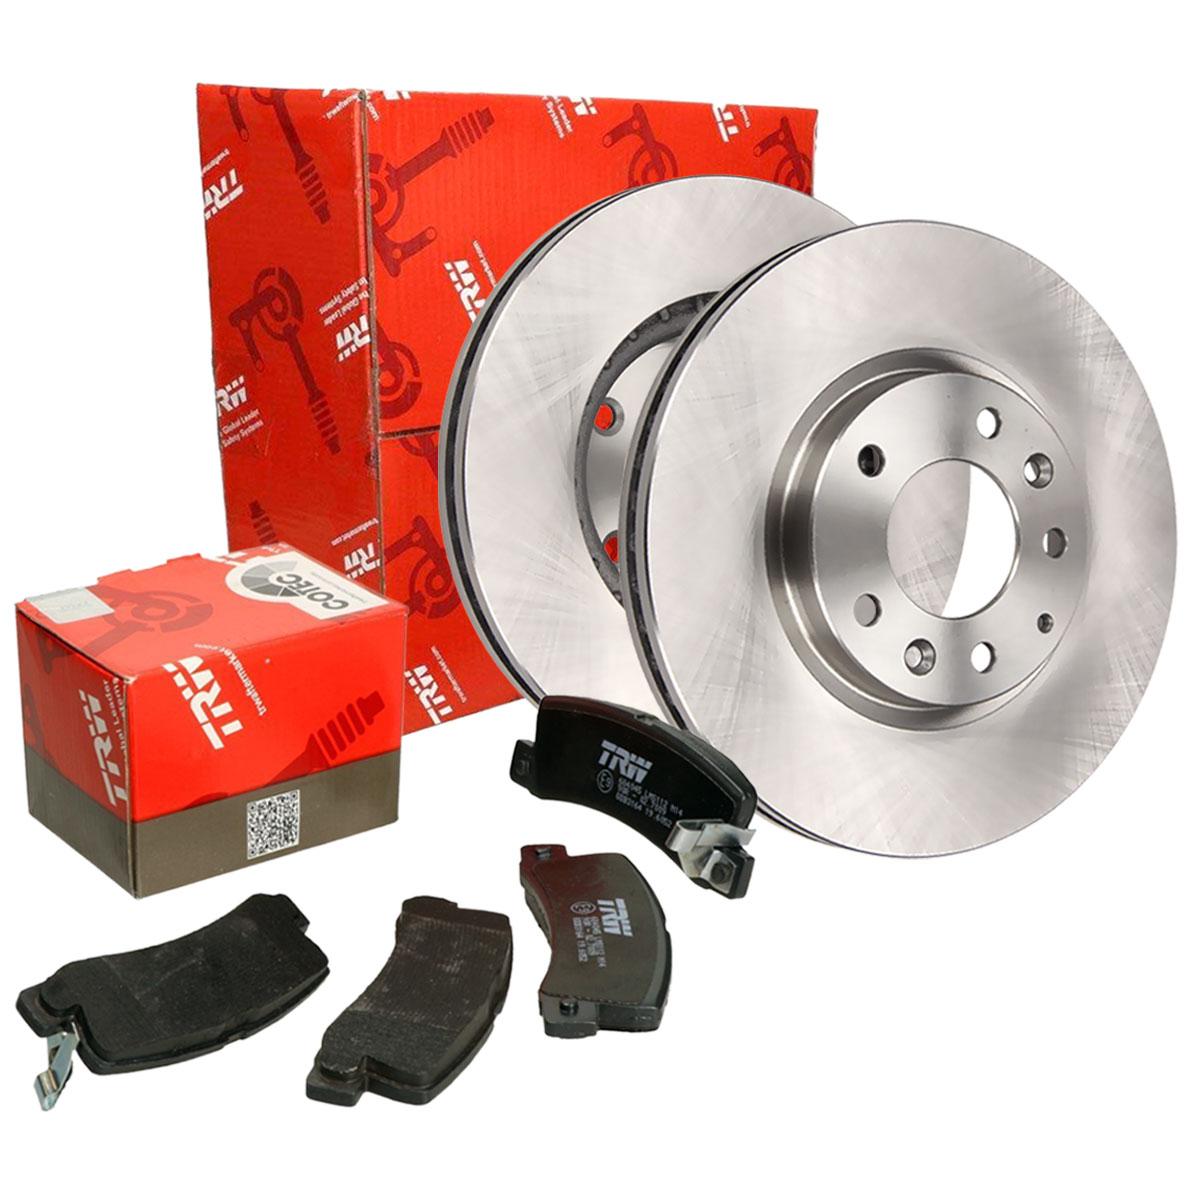 Bremsbeläge Hinten HA Bremsensatz Bremsen VW NEW BEETLE 2,3 V5 Bremsscheiben